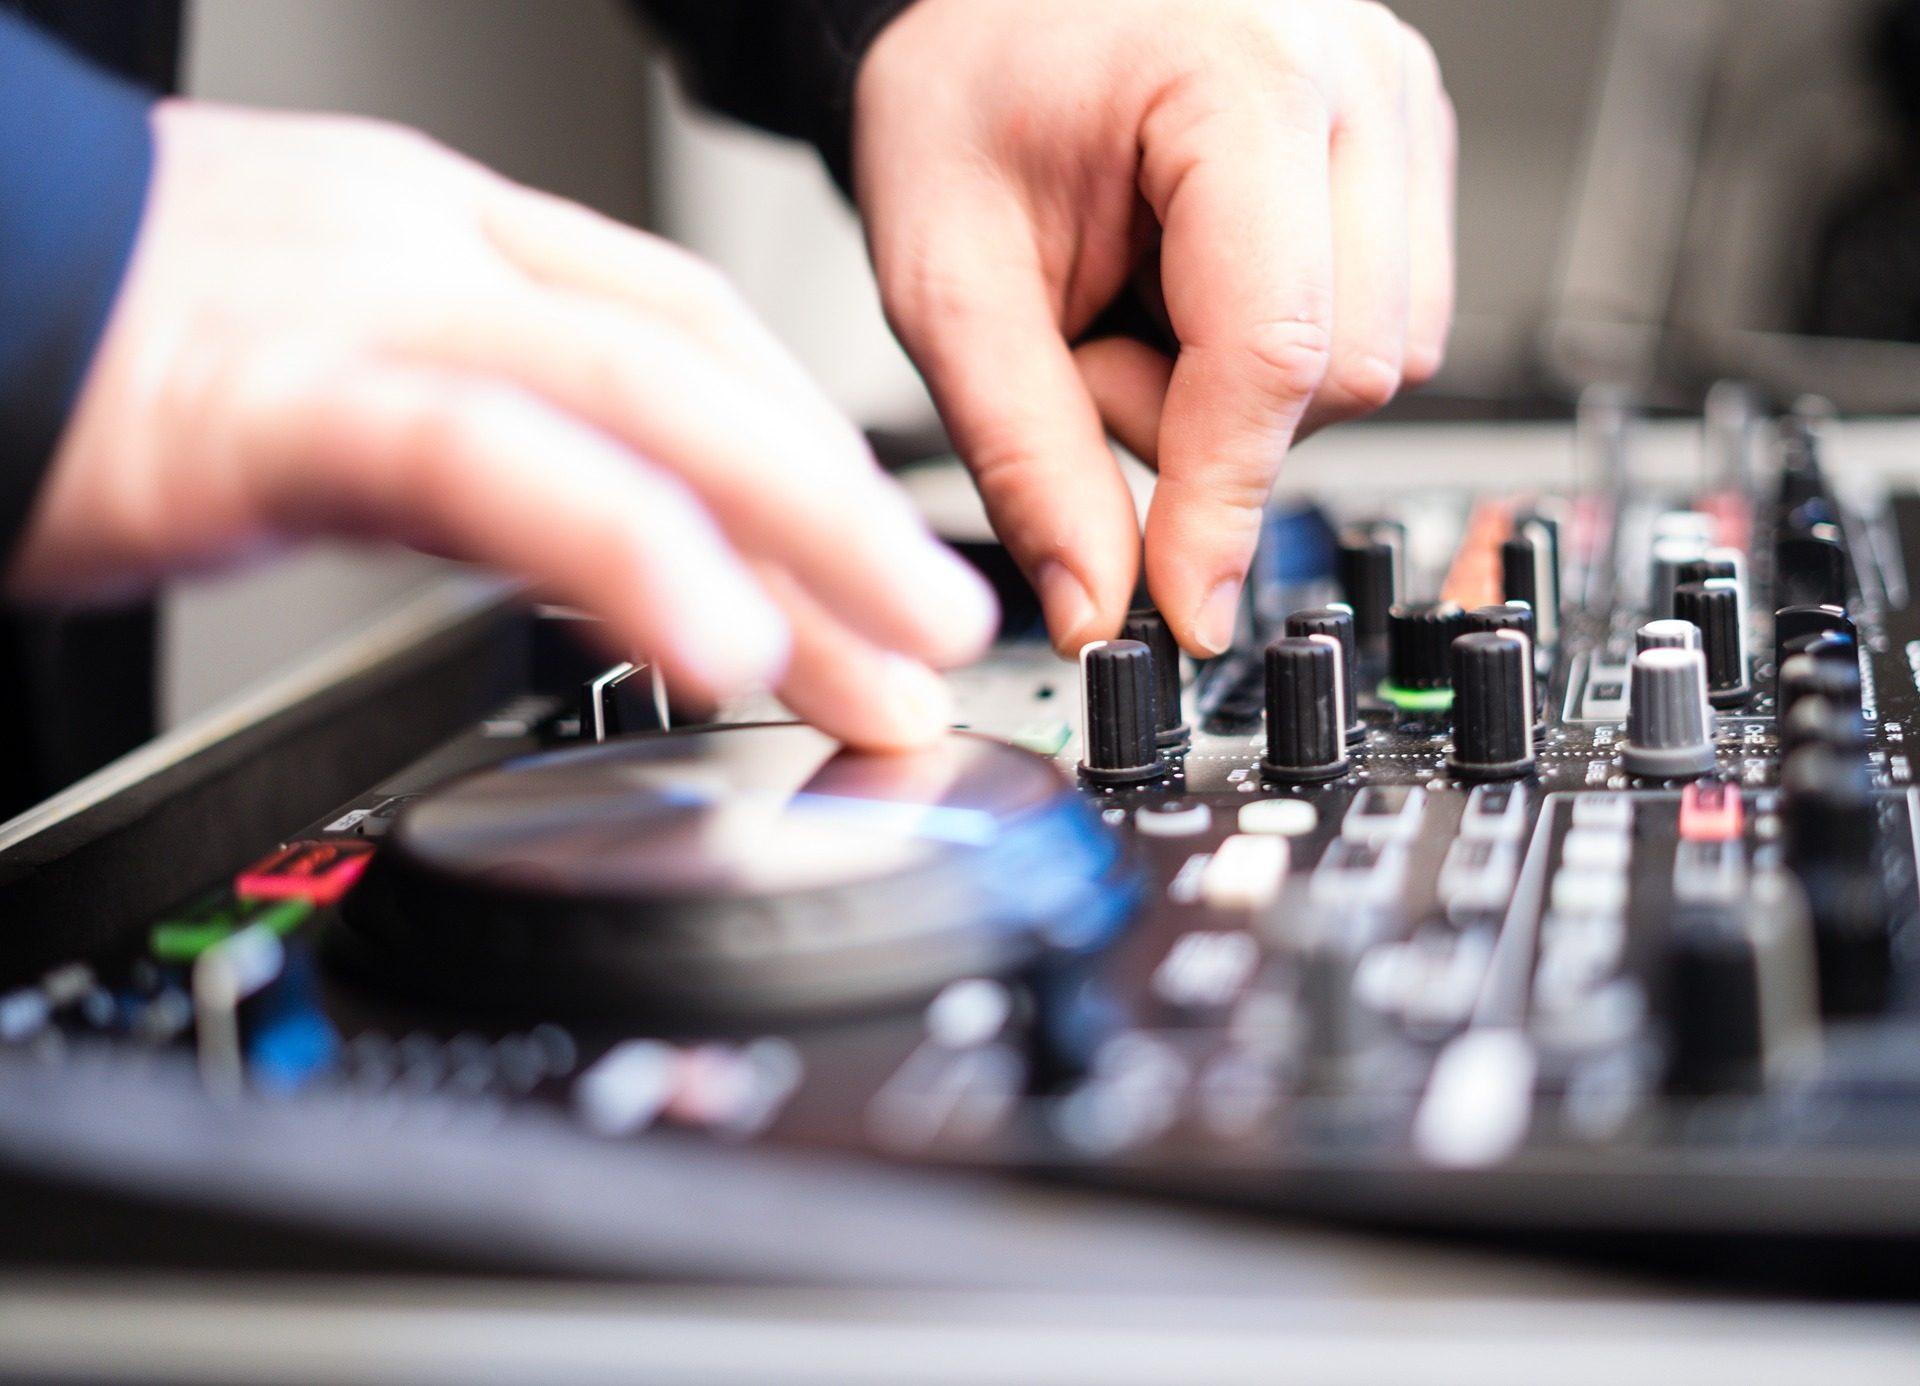 tavolo, miscele, mani, DJ, pulsanti, ruote - Sfondi HD - Professor-falken.com